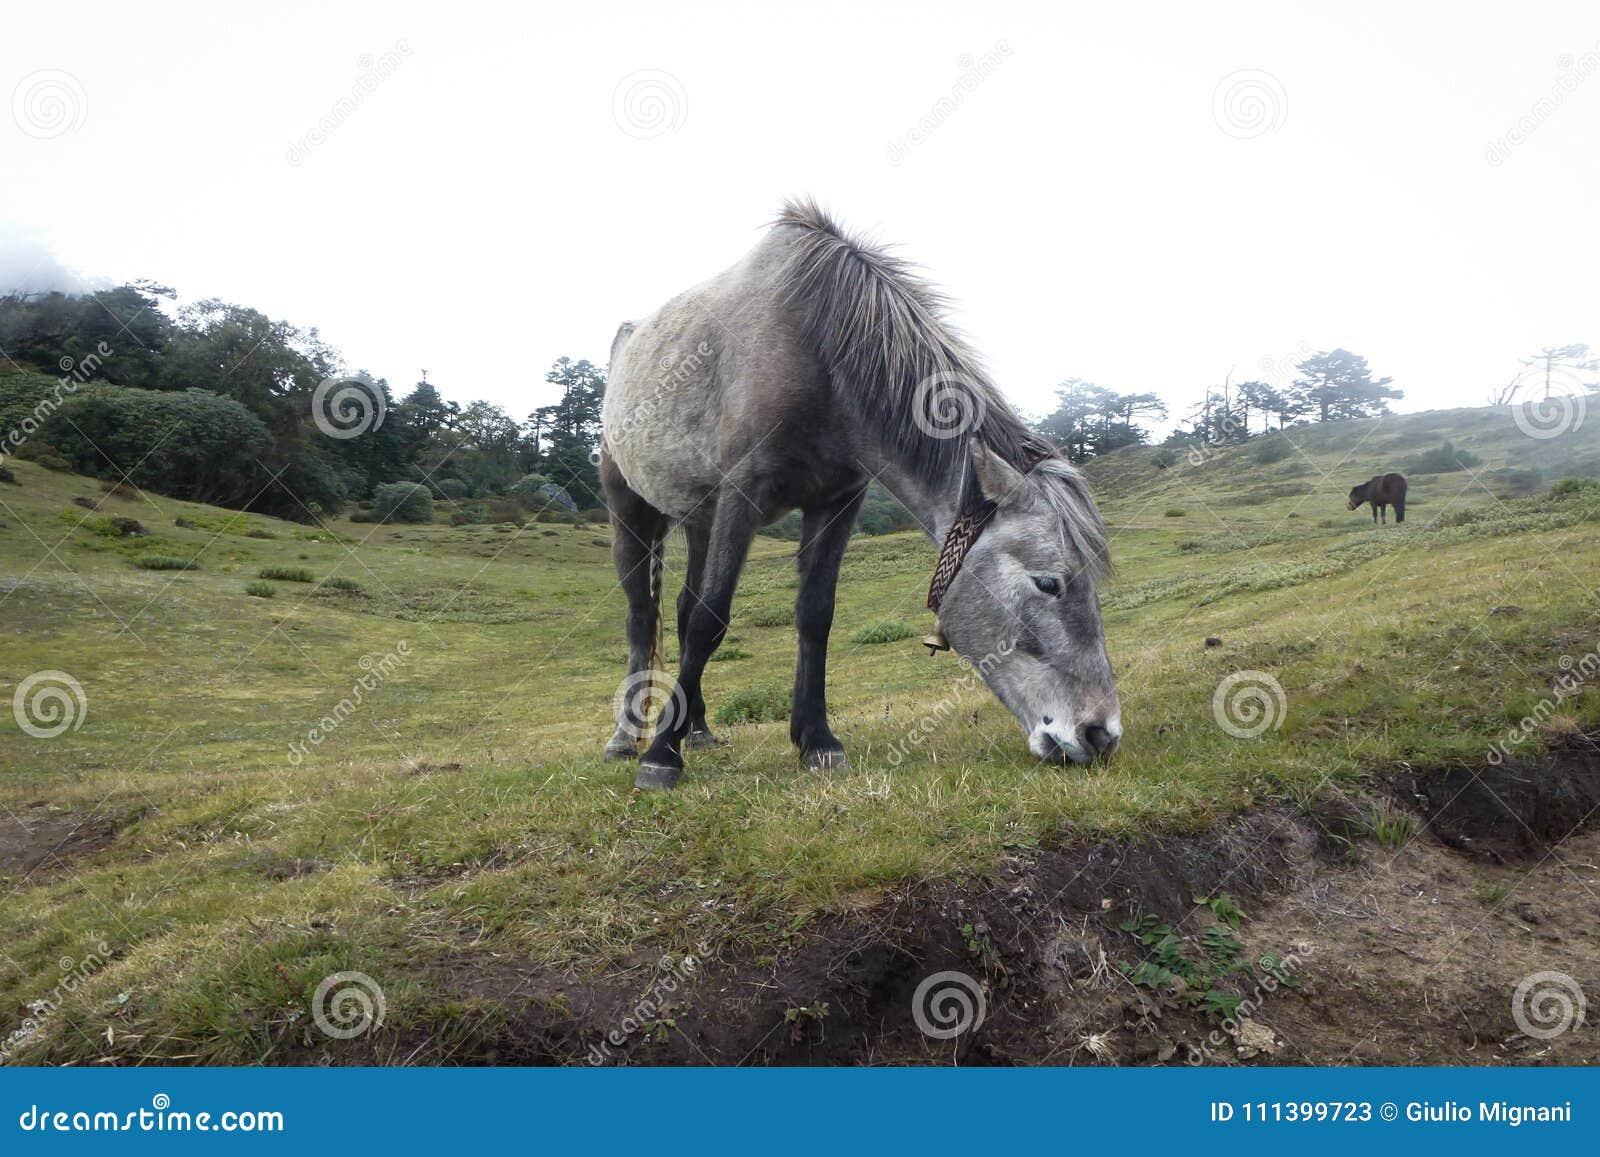 Horse eating grass, Namche Bazaar, Everest Base Camp trek, Nepal